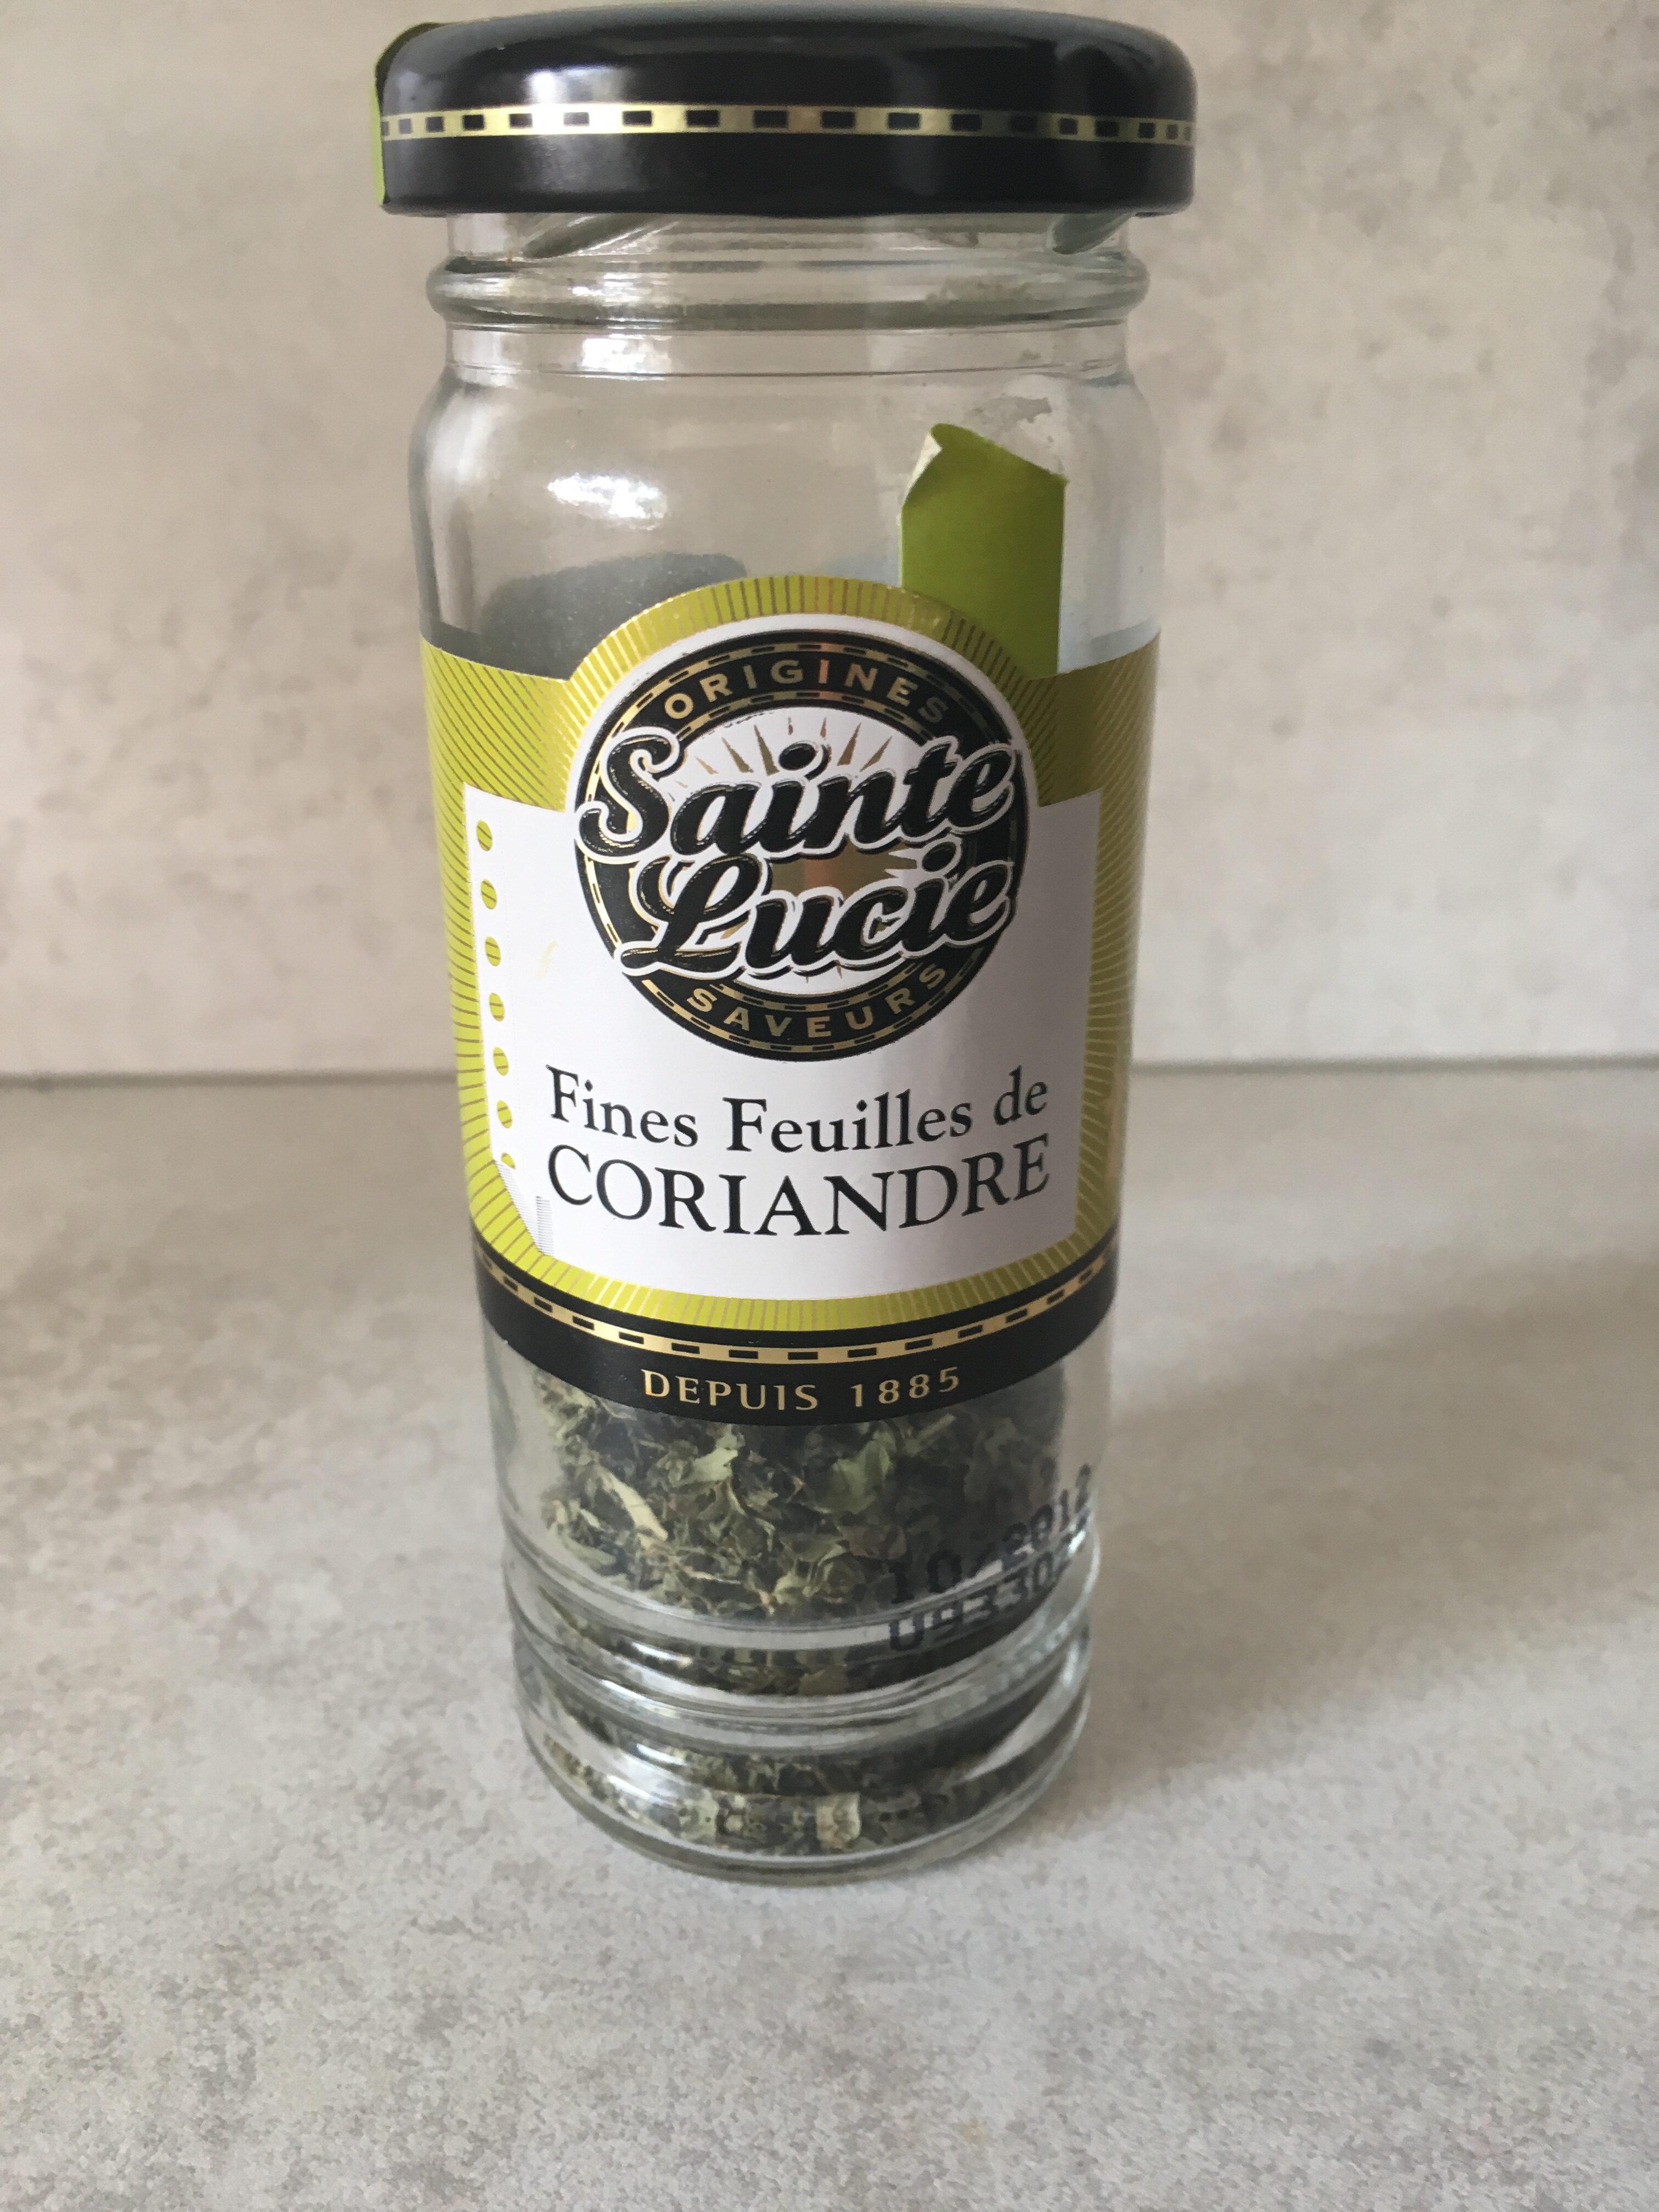 Coriandre - Product